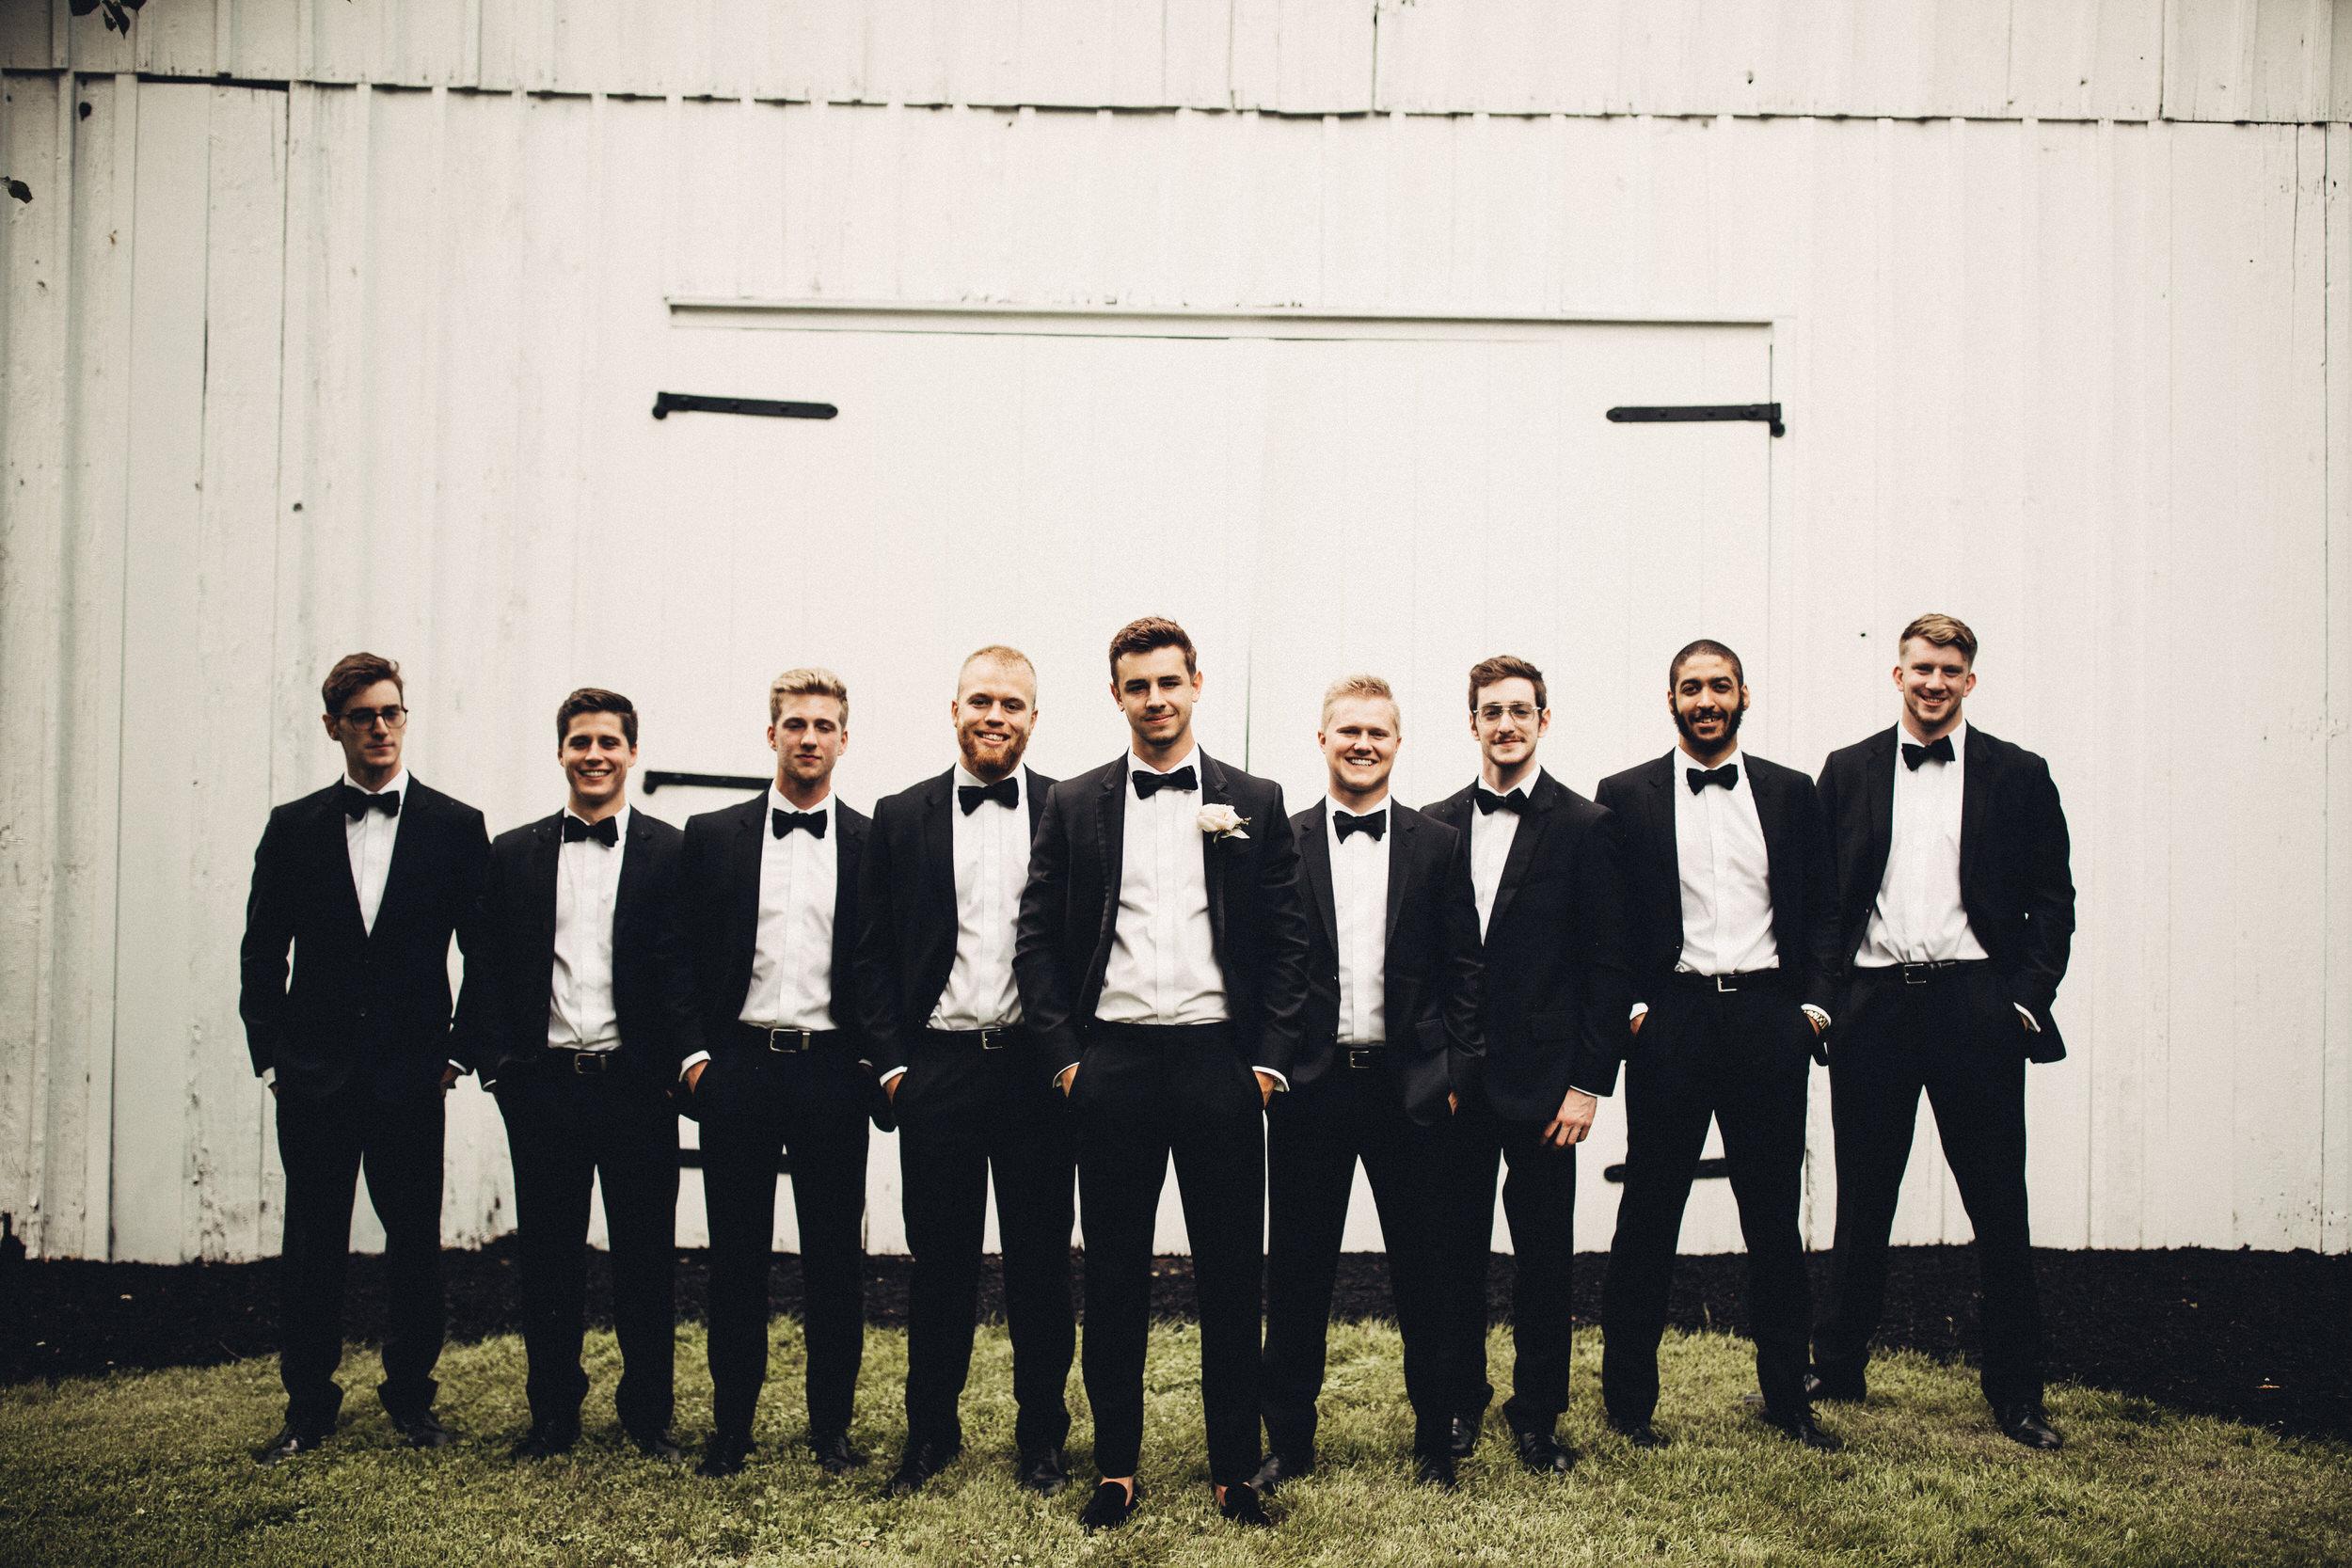 Groomsmen in Black Tuxedo